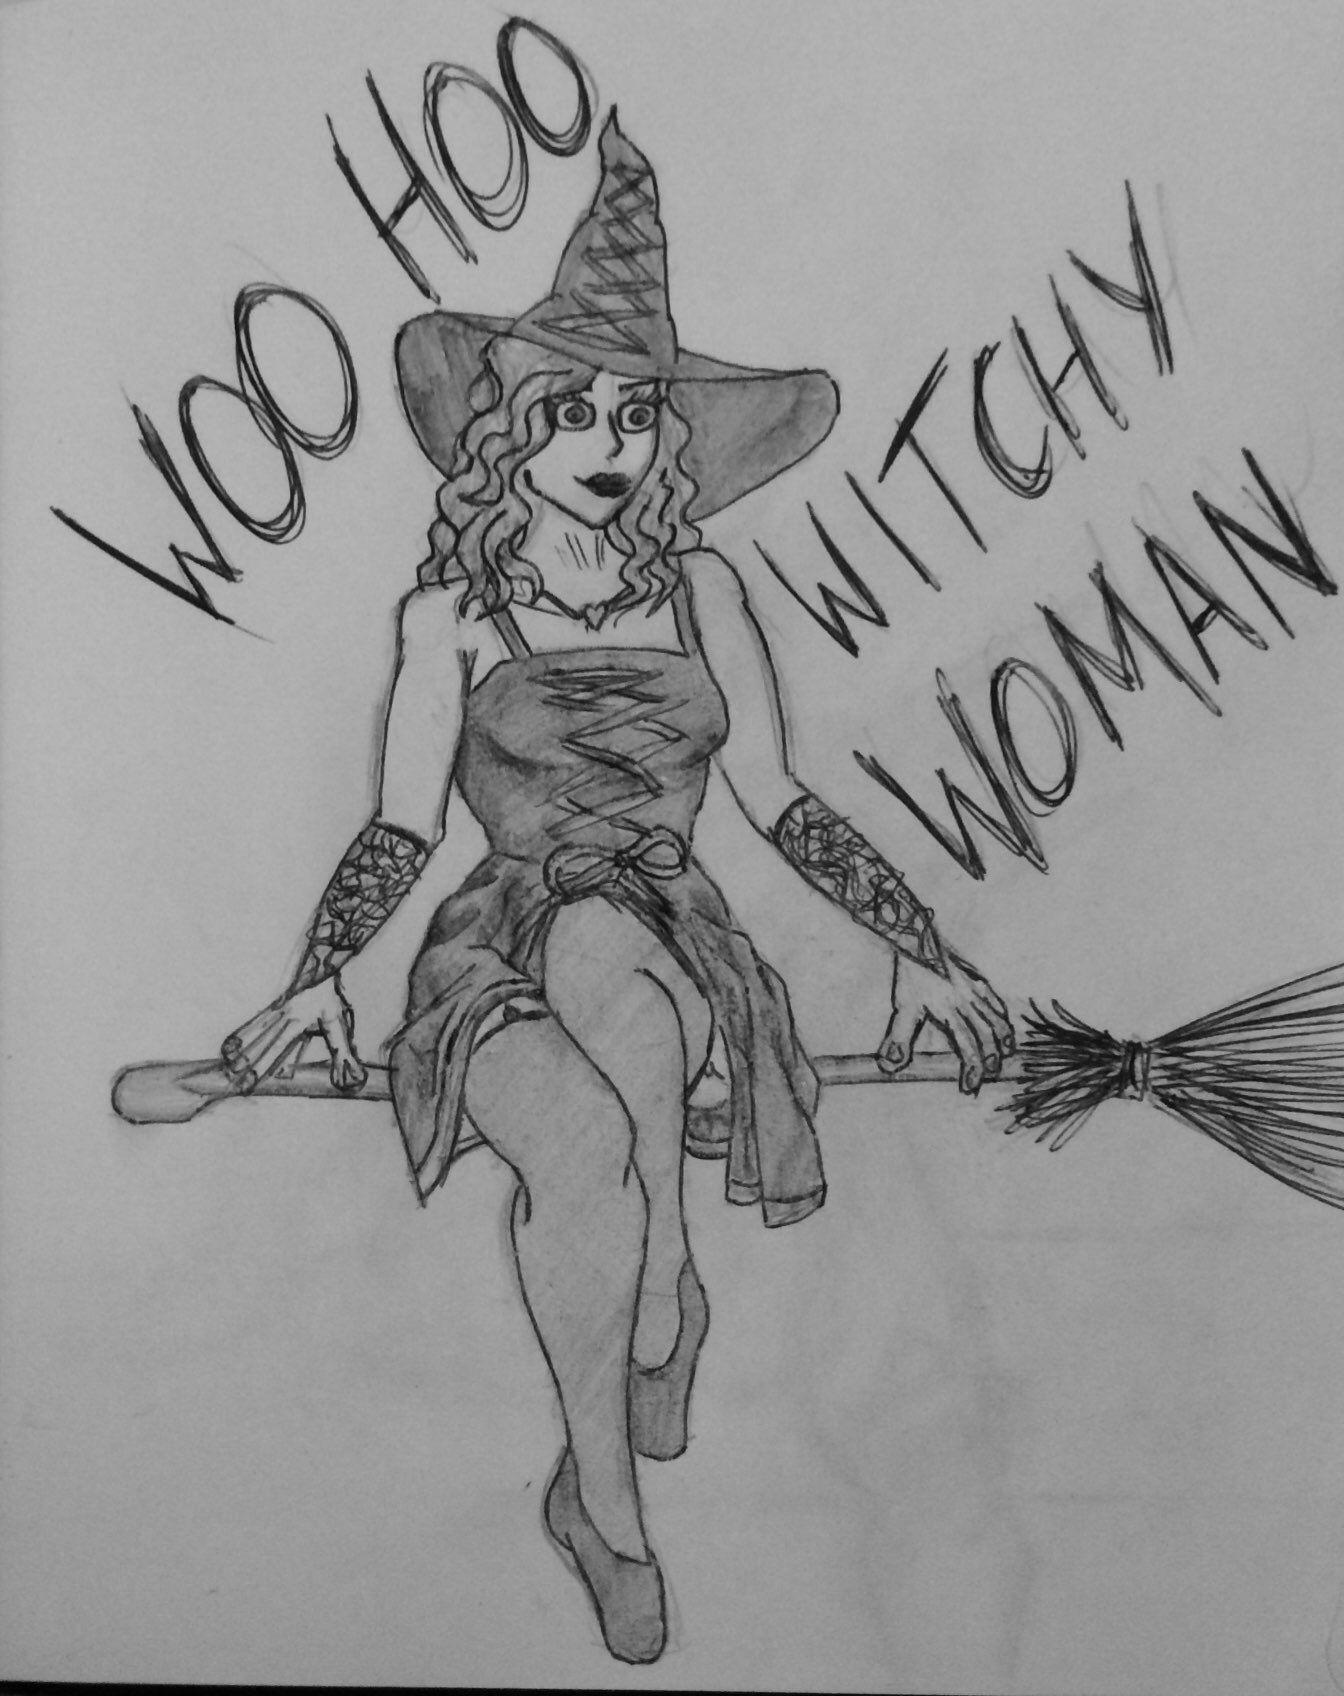 Woo Hoo Witchy Woman B+W